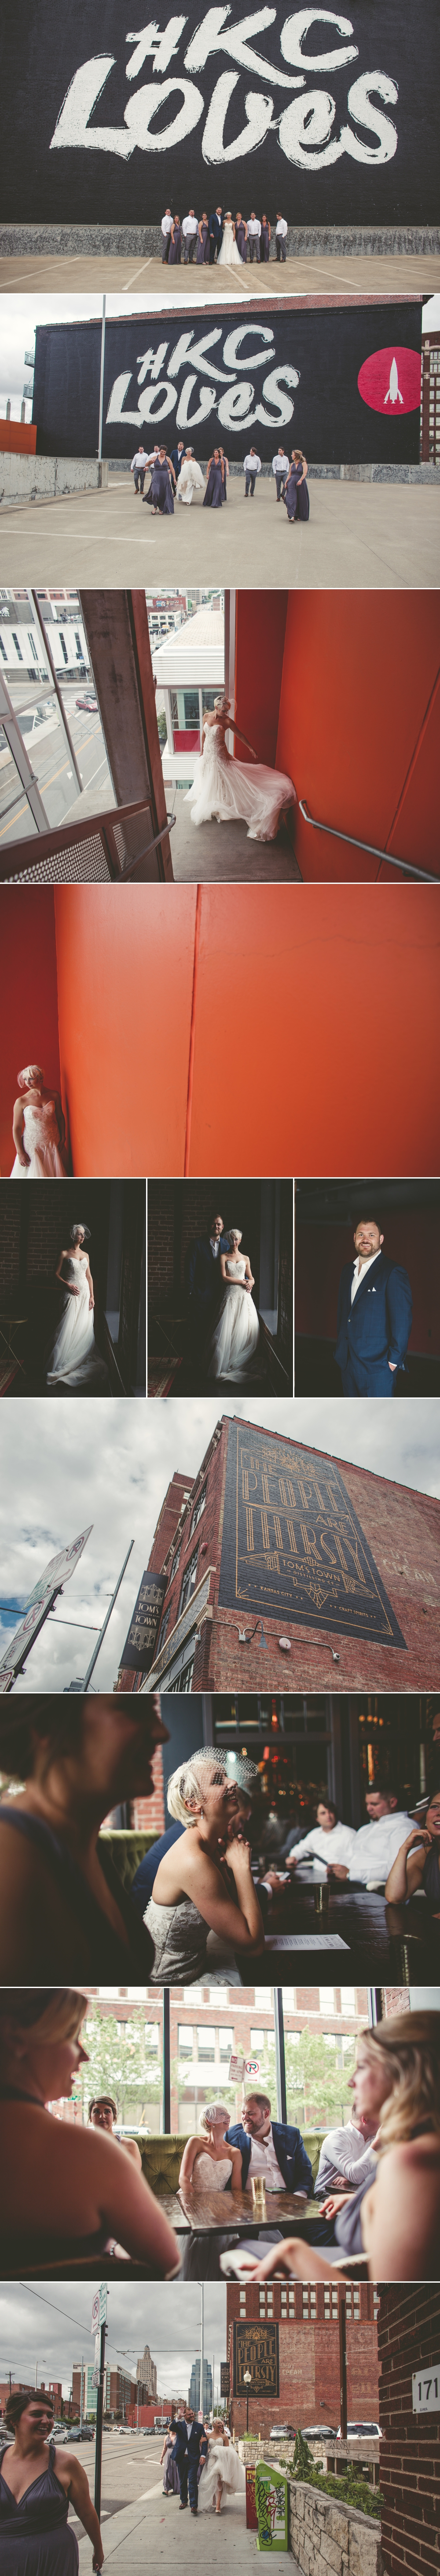 jason_domingues_photography_best_kansas_city_photographer_kc_weddings_toms_town_bauer_0002